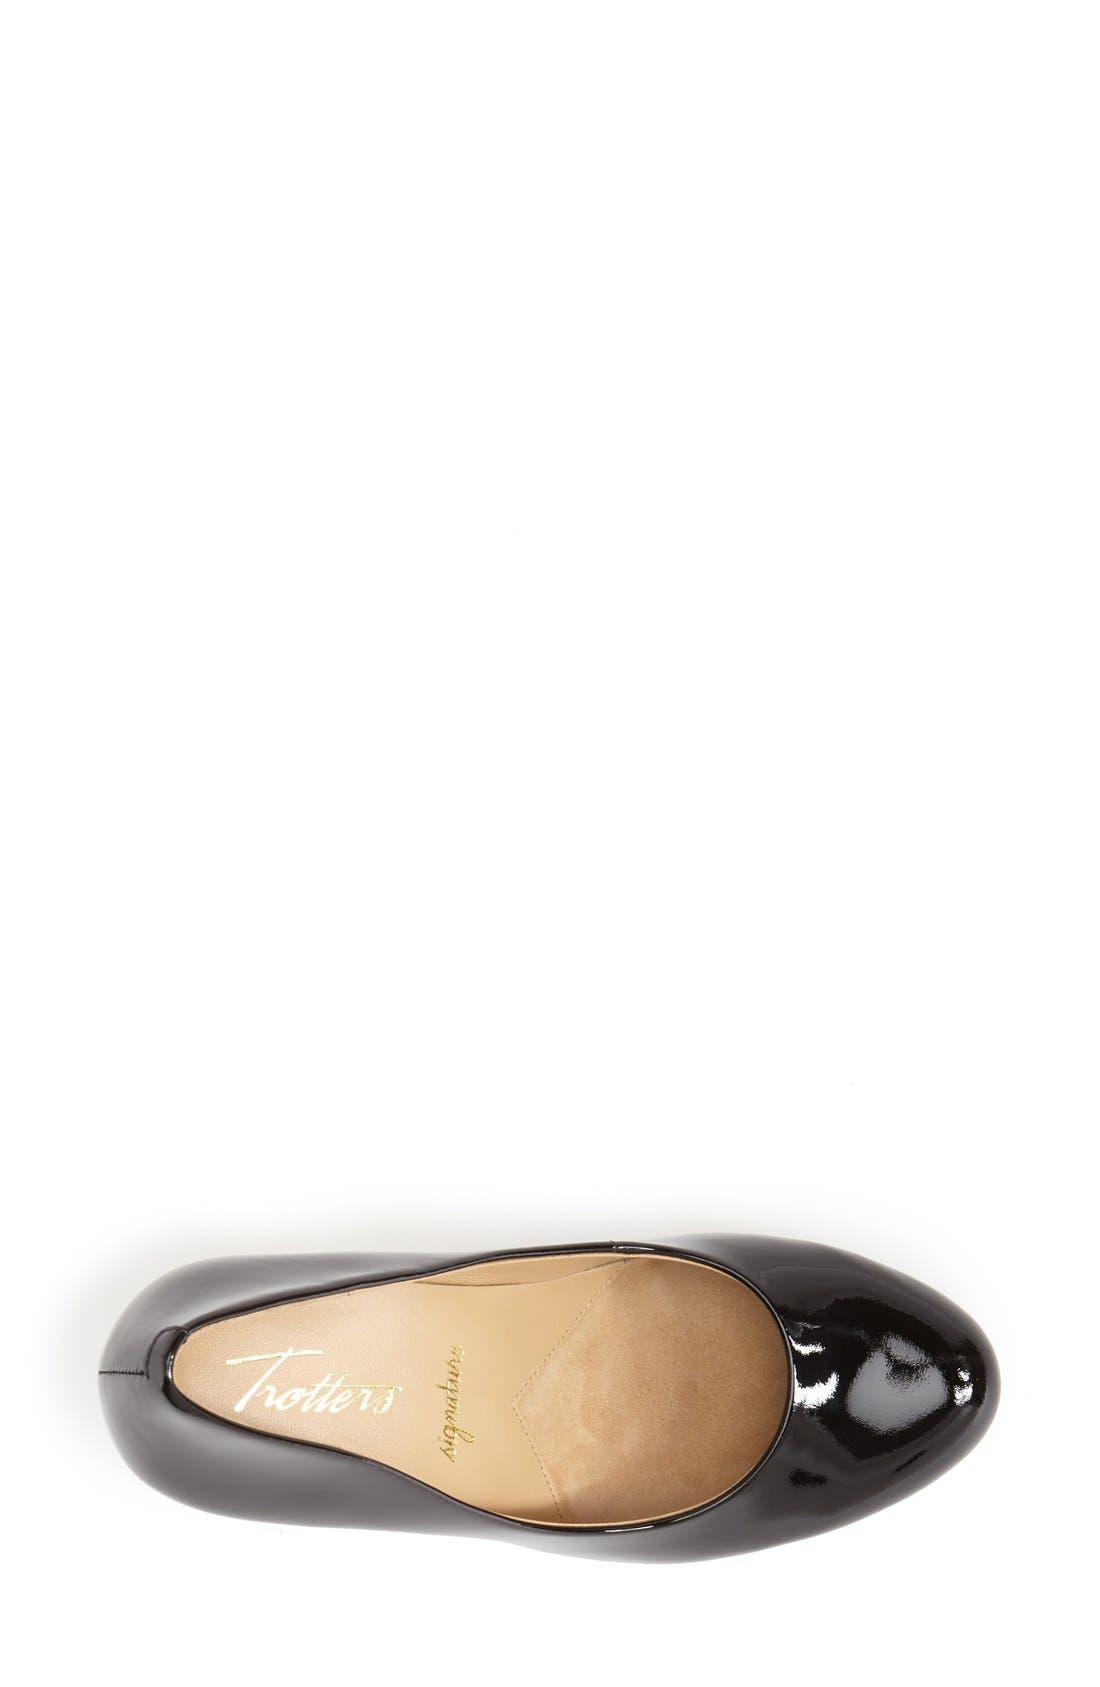 TROTTERS, 'Signature Gigi' Round Toe Pump, Alternate thumbnail 2, color, BLACK PATENT